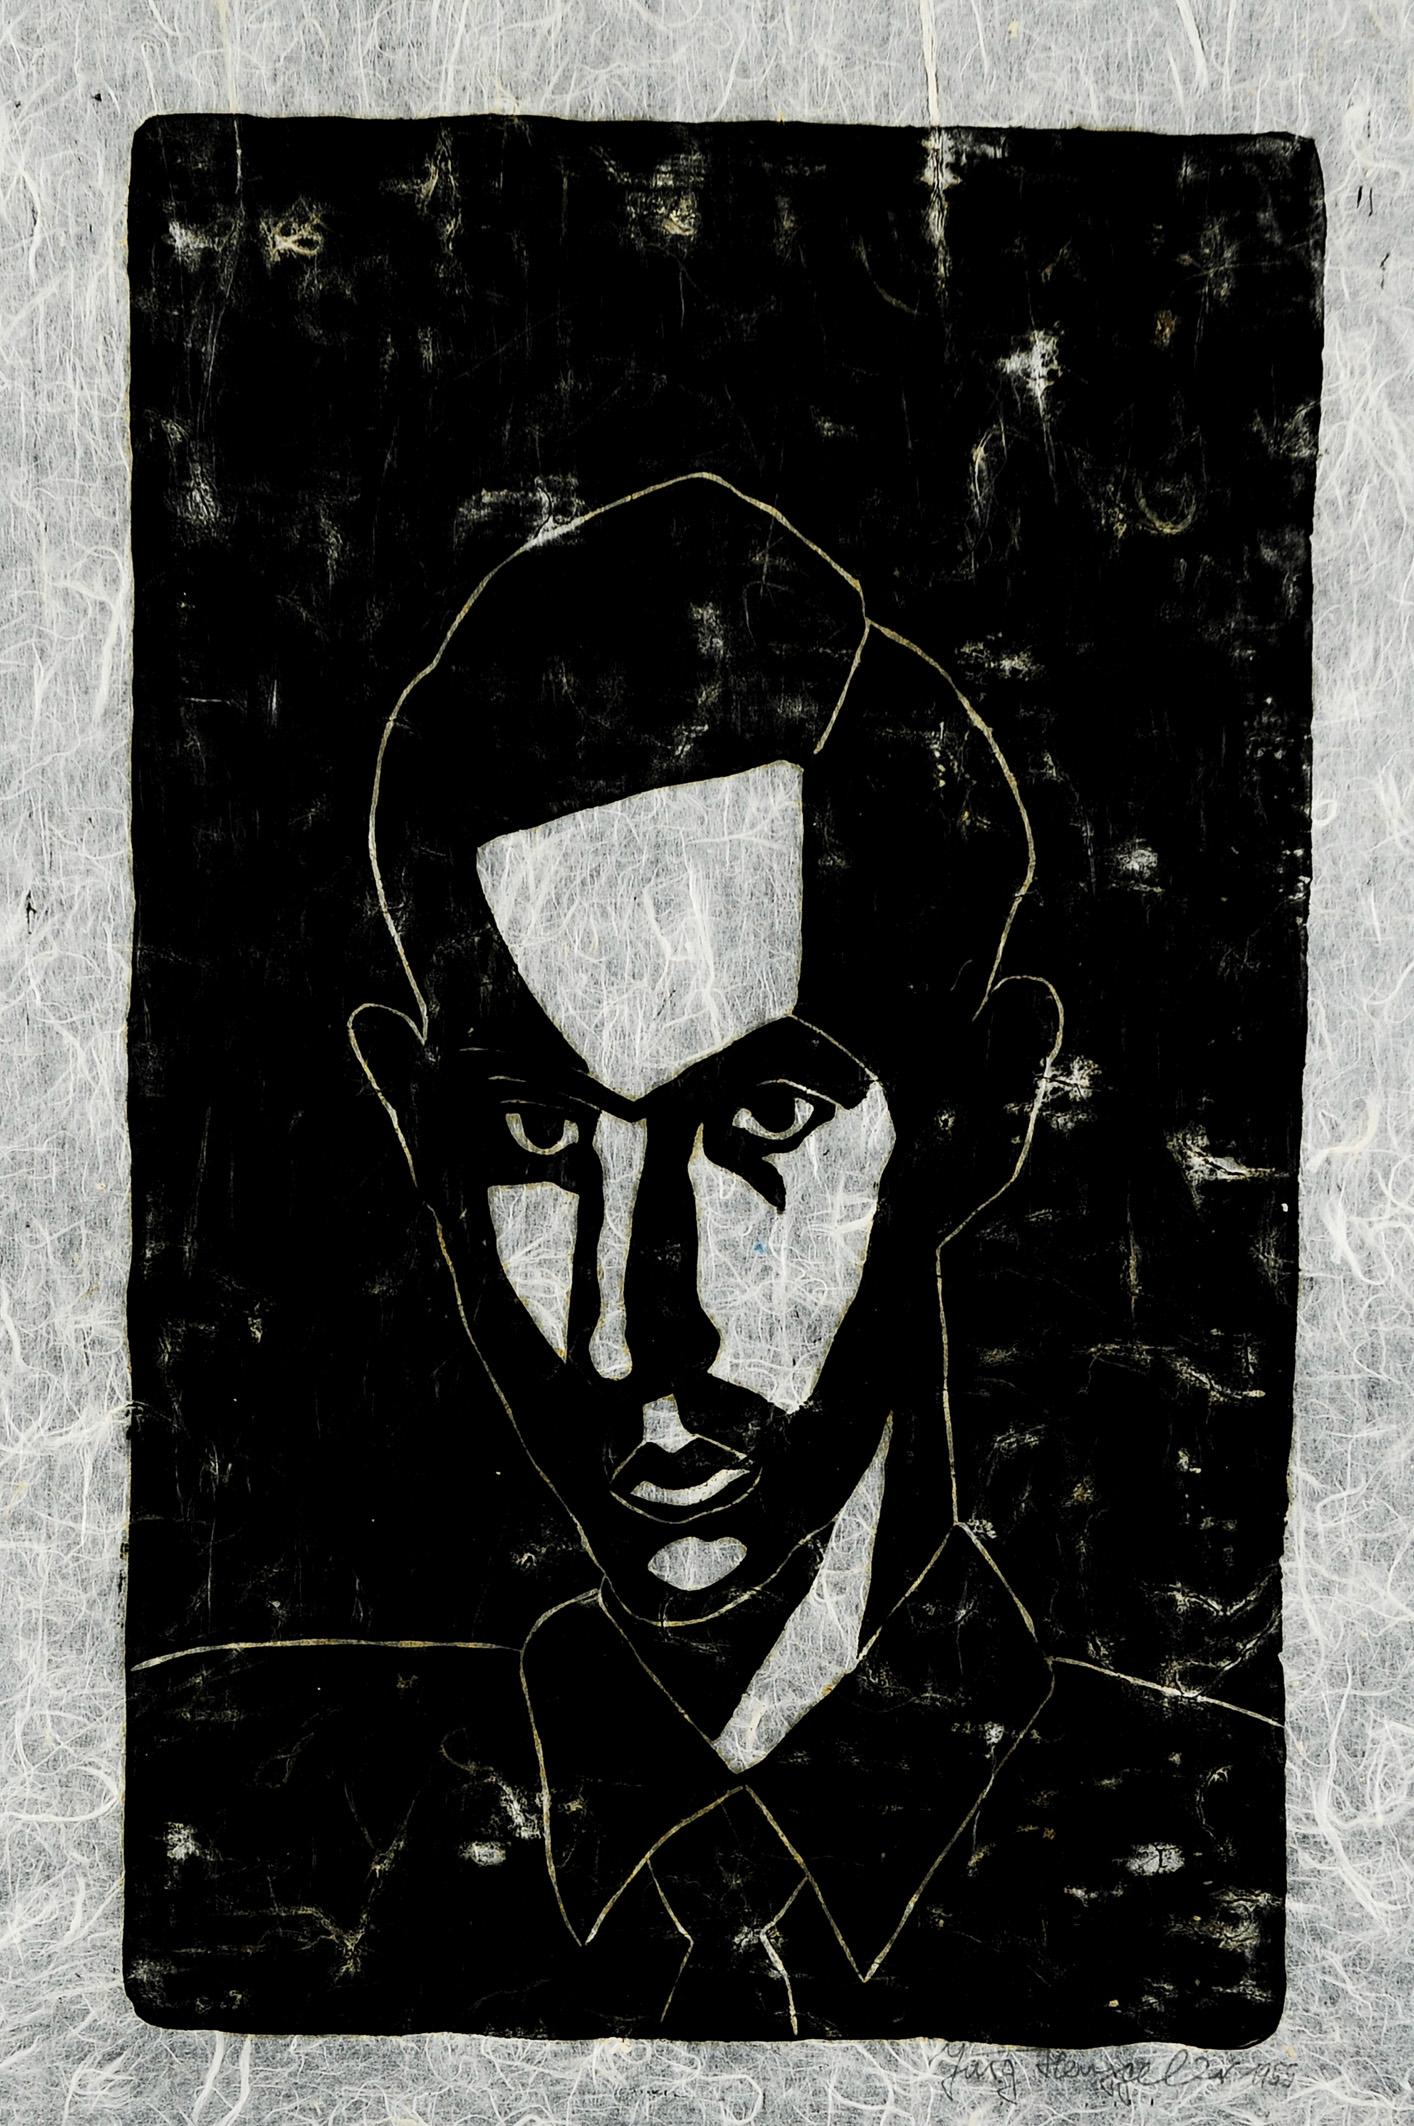 Selbstporträt, 1955. Holzschnitt auf Japanpapier, links unten bezeichnet.